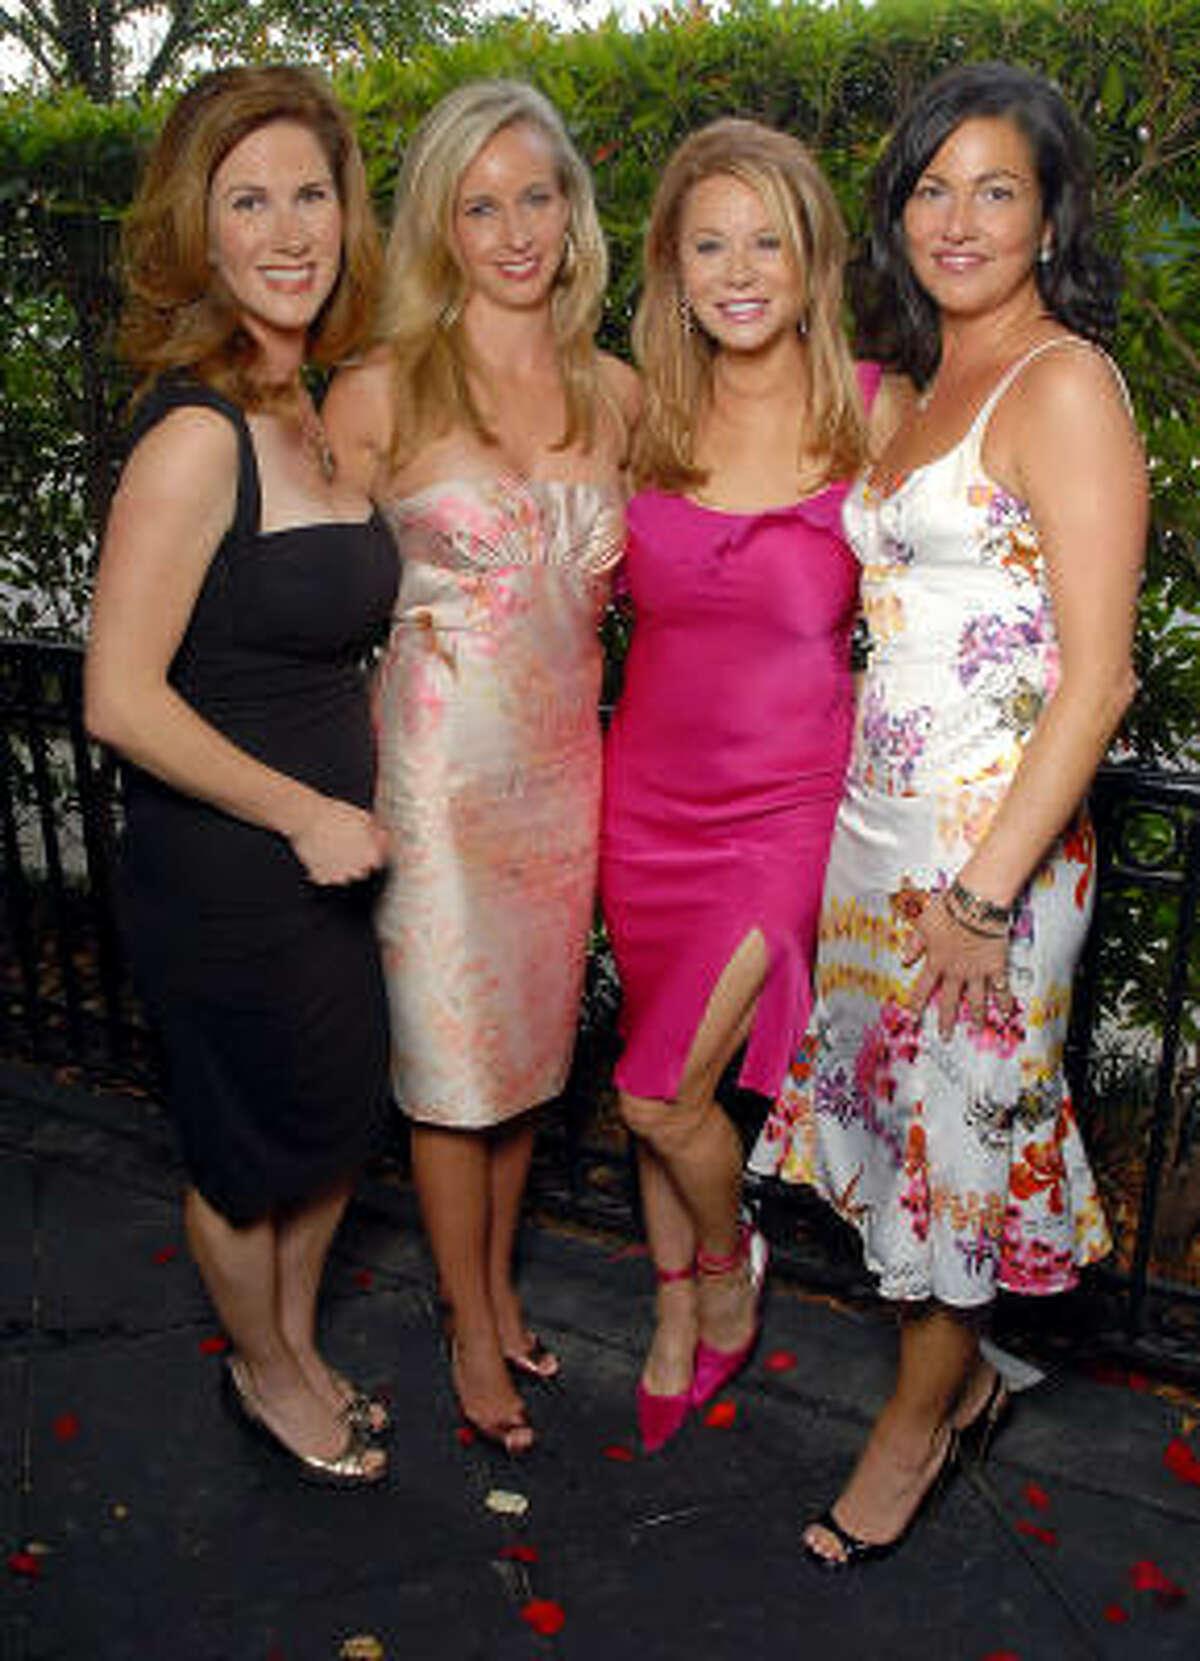 From left: Maeve Pesquera, Robin Reimer, Cindi Rose and Jessica Rossman